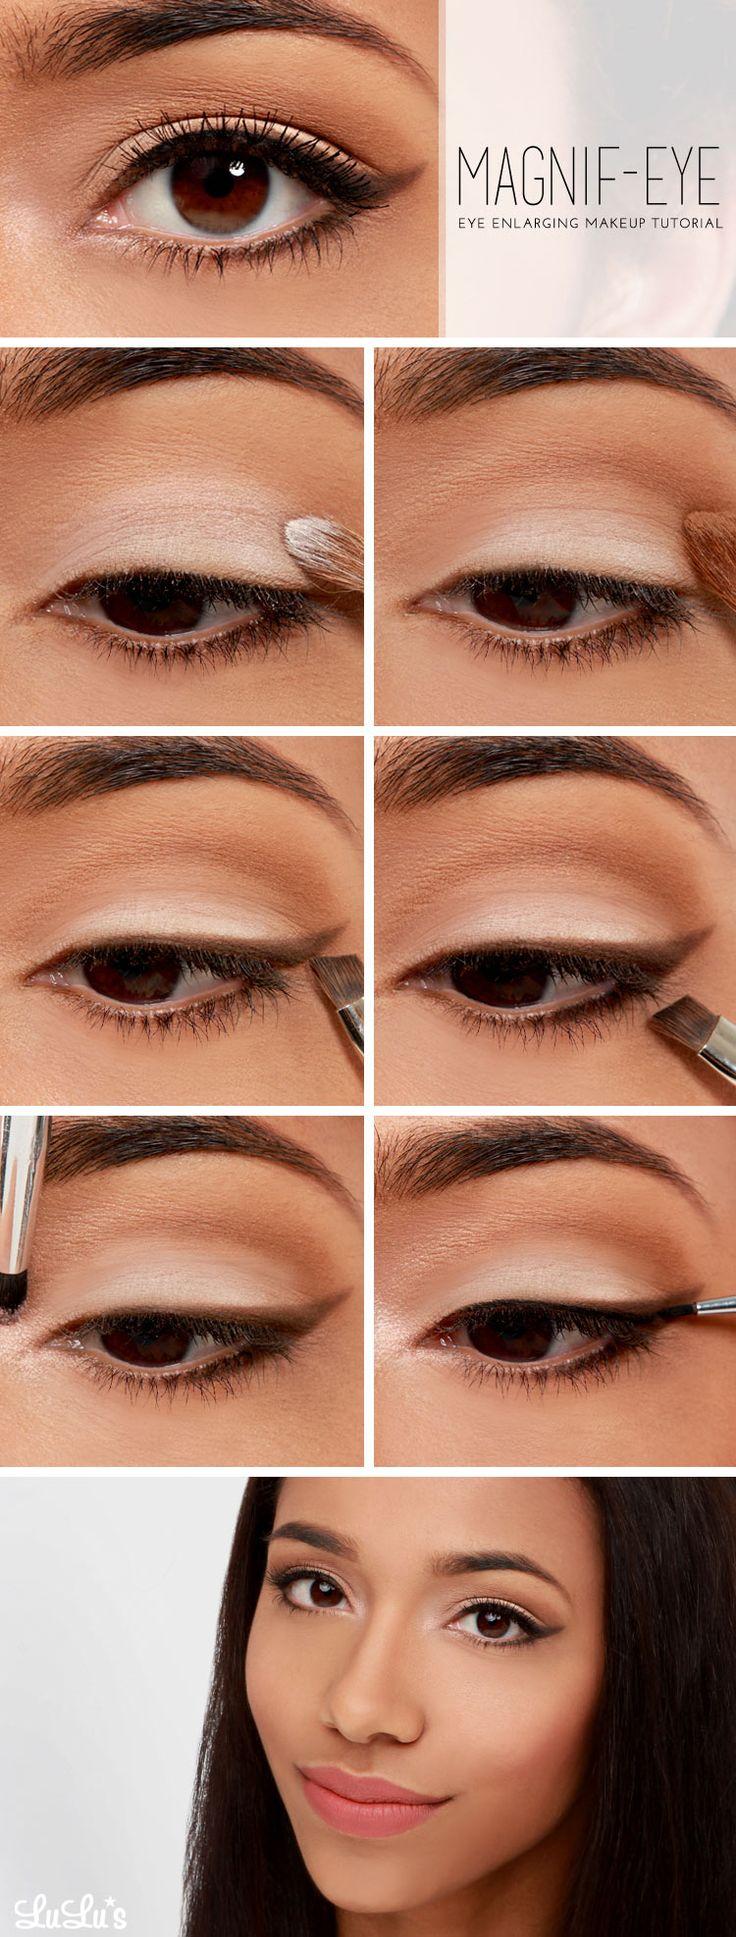 LuLu*s How-To: Eye Enlarging Makeup Tutorial - Lulus.com Fashion Blog